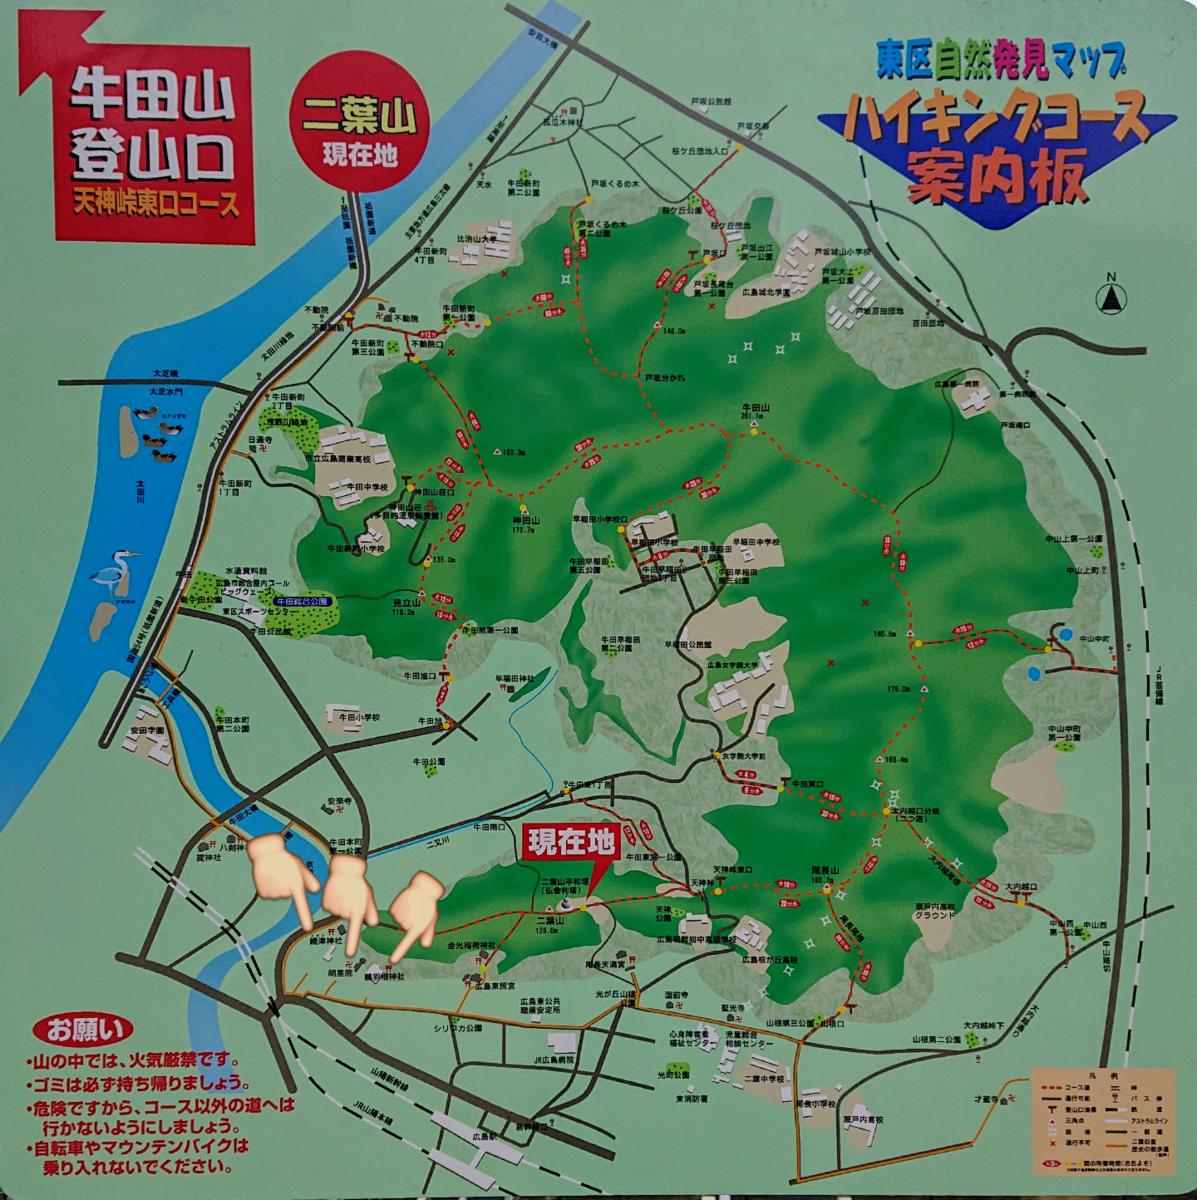 f:id:Kaimotu_Hatuji:20200103025943p:plain